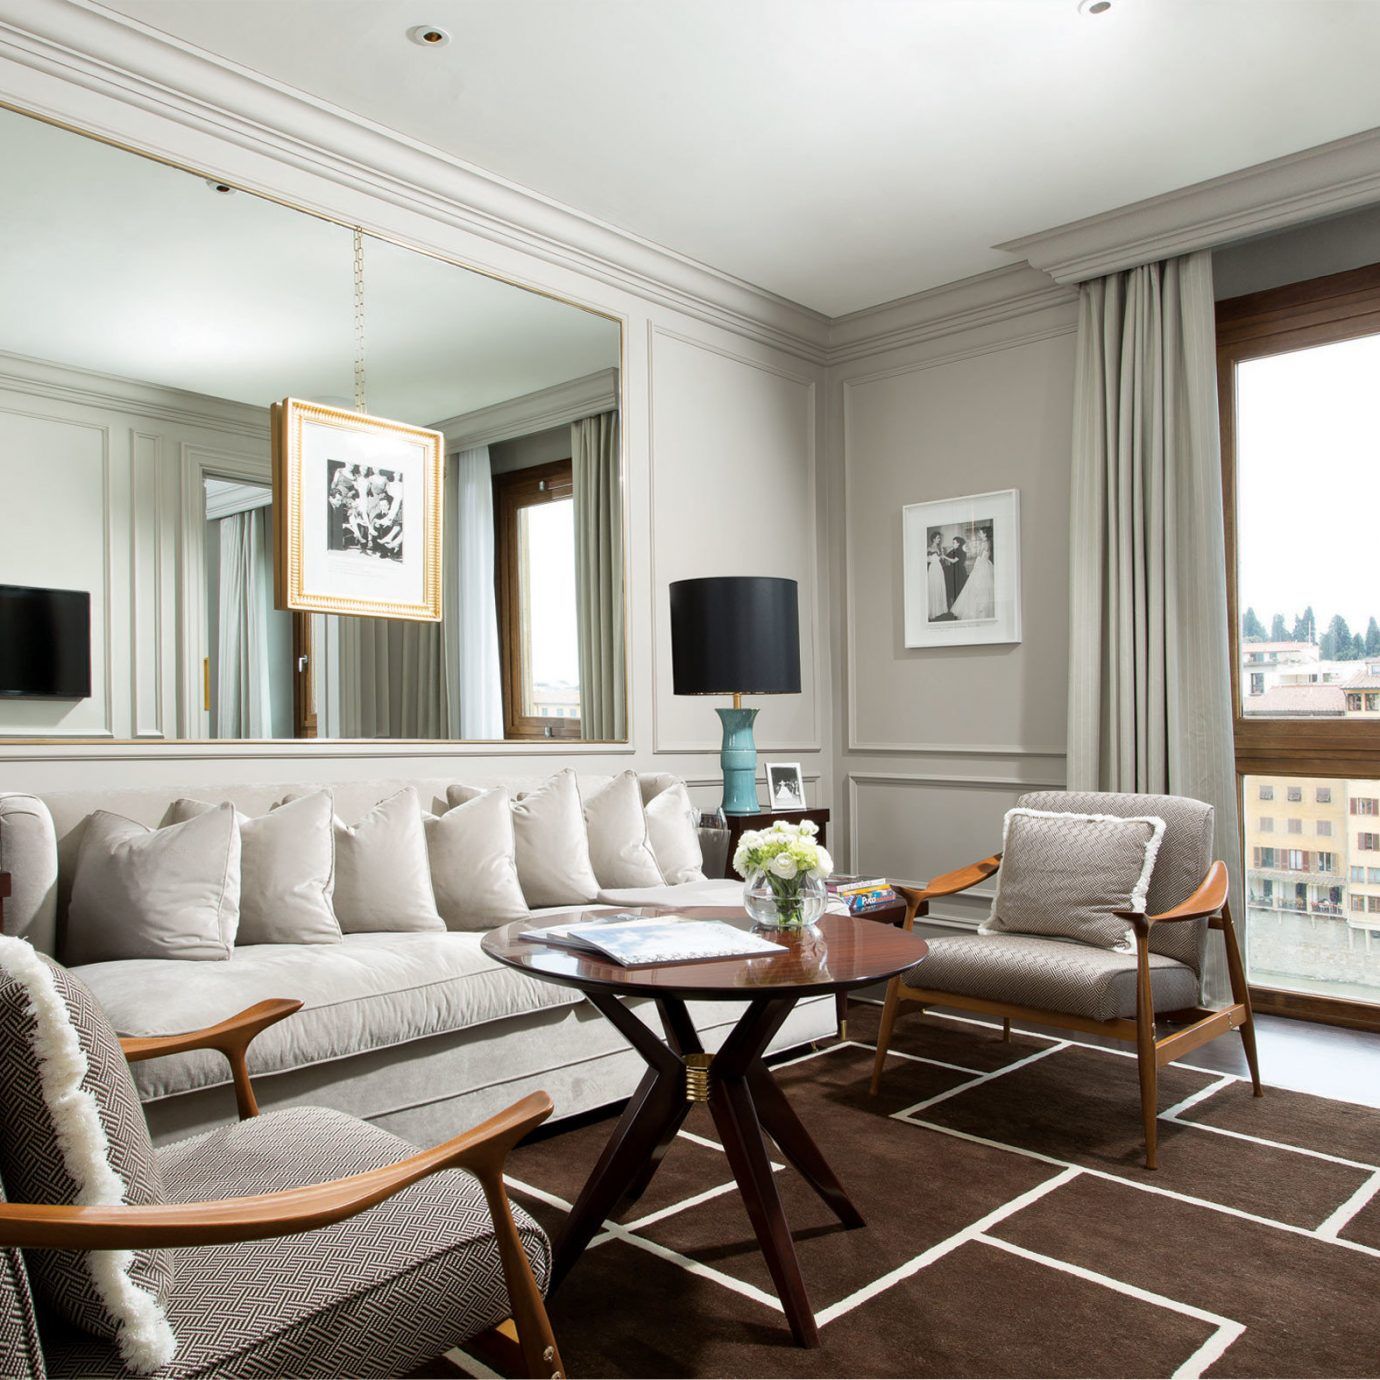 Classic Luxury Suite living room chair property home condominium hardwood Bedroom